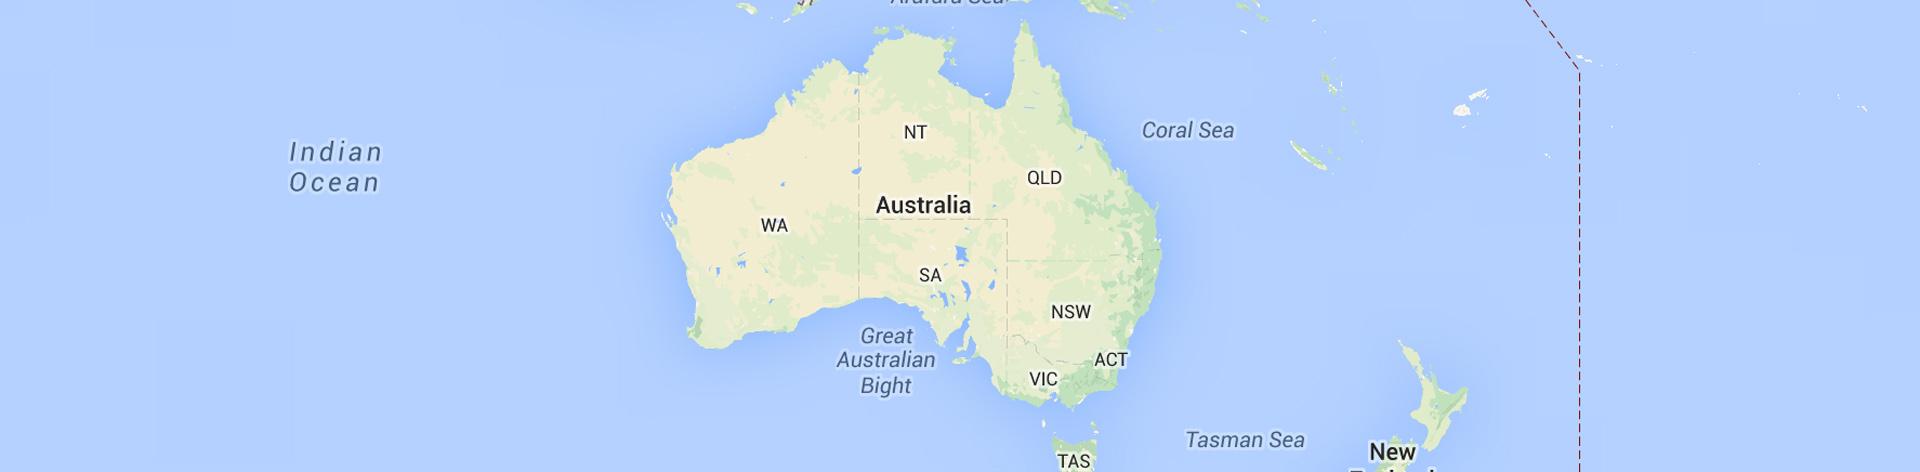 Service Areas - Australian Electrical, HVAC & Plumbing